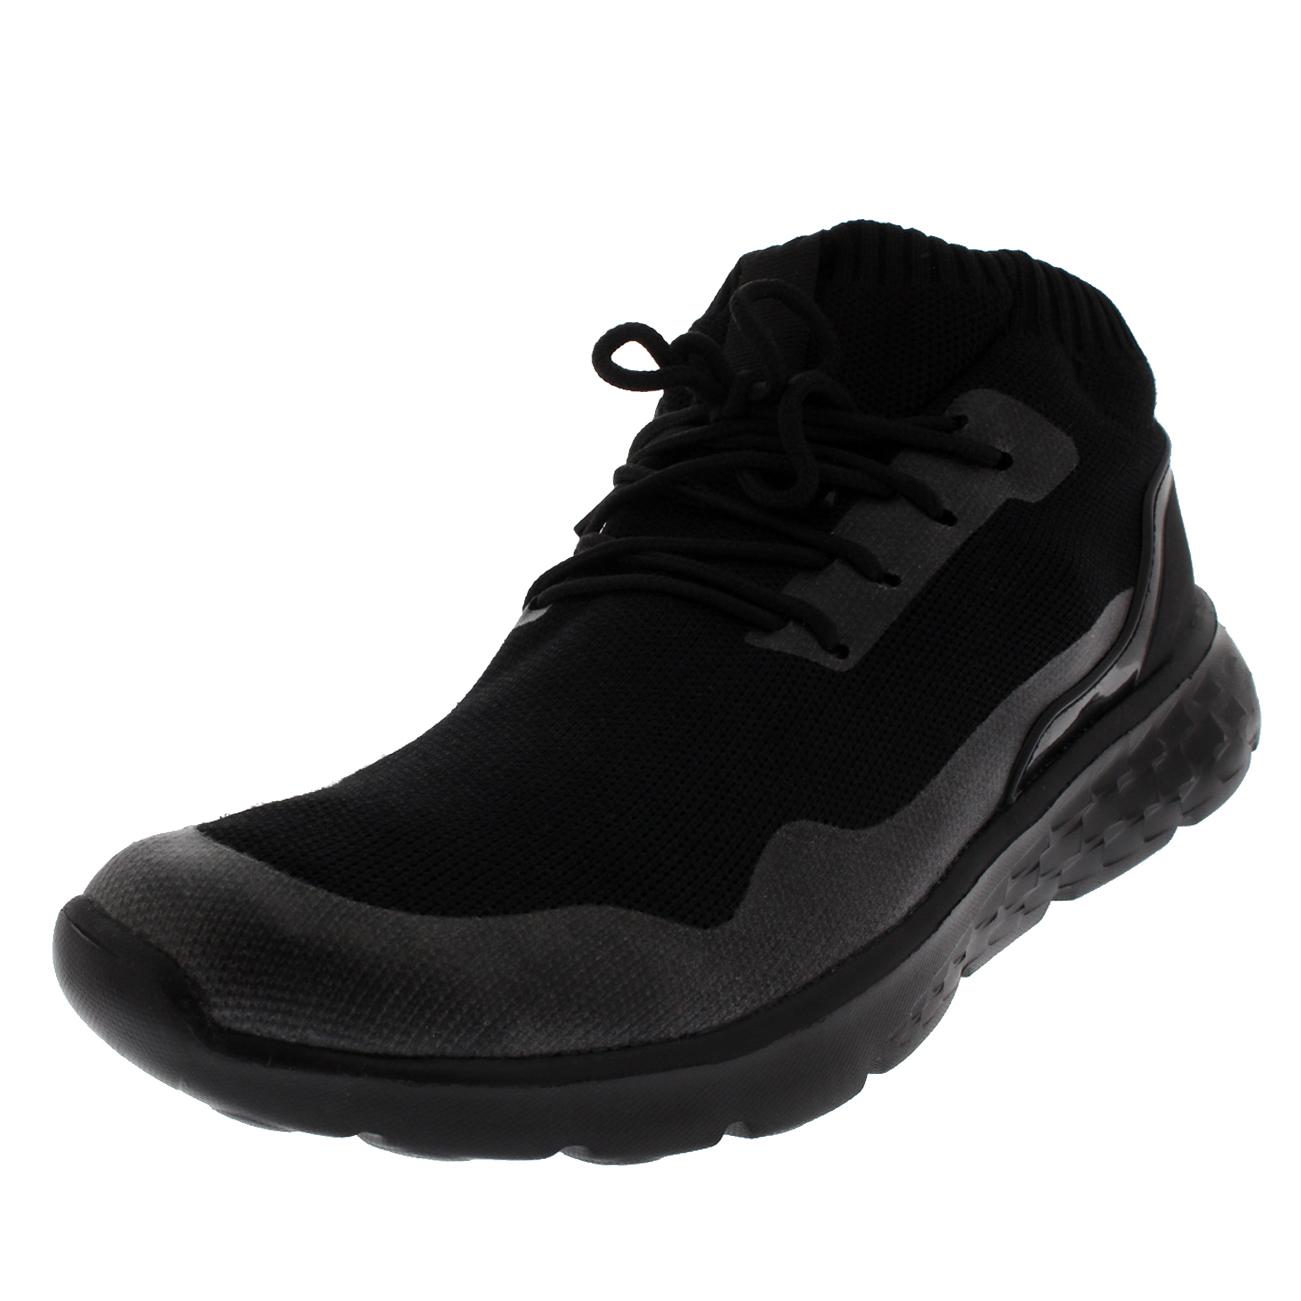 Para-Mujer-Fitness-Correr-Caminar-Gimnasio-Entrenadores-Acolchado-Ligero-Calcetin-UK-3-10